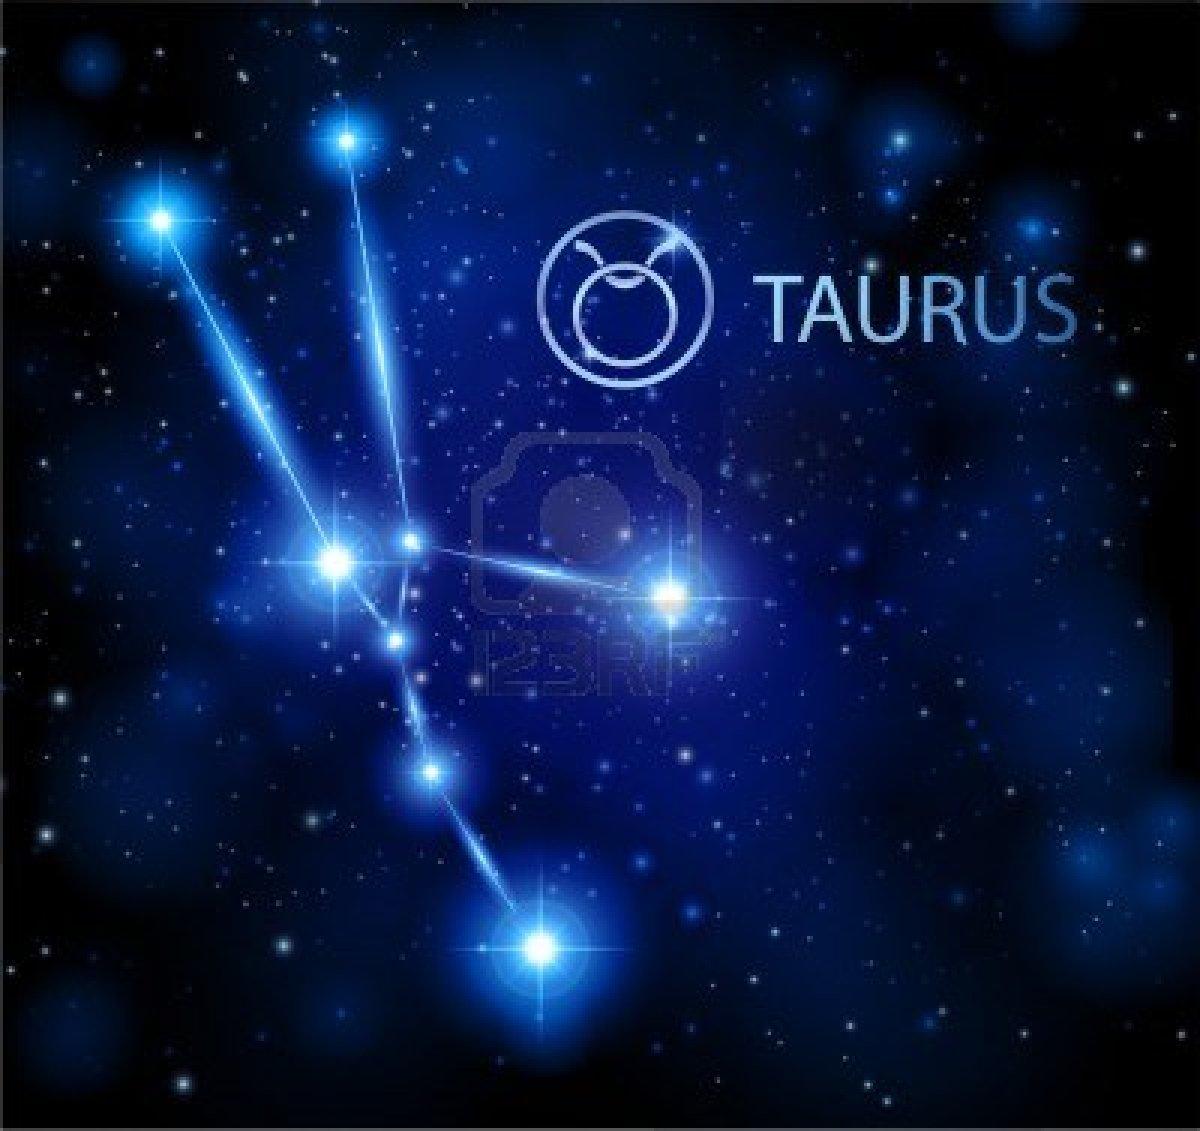 hispavista horoscopos: